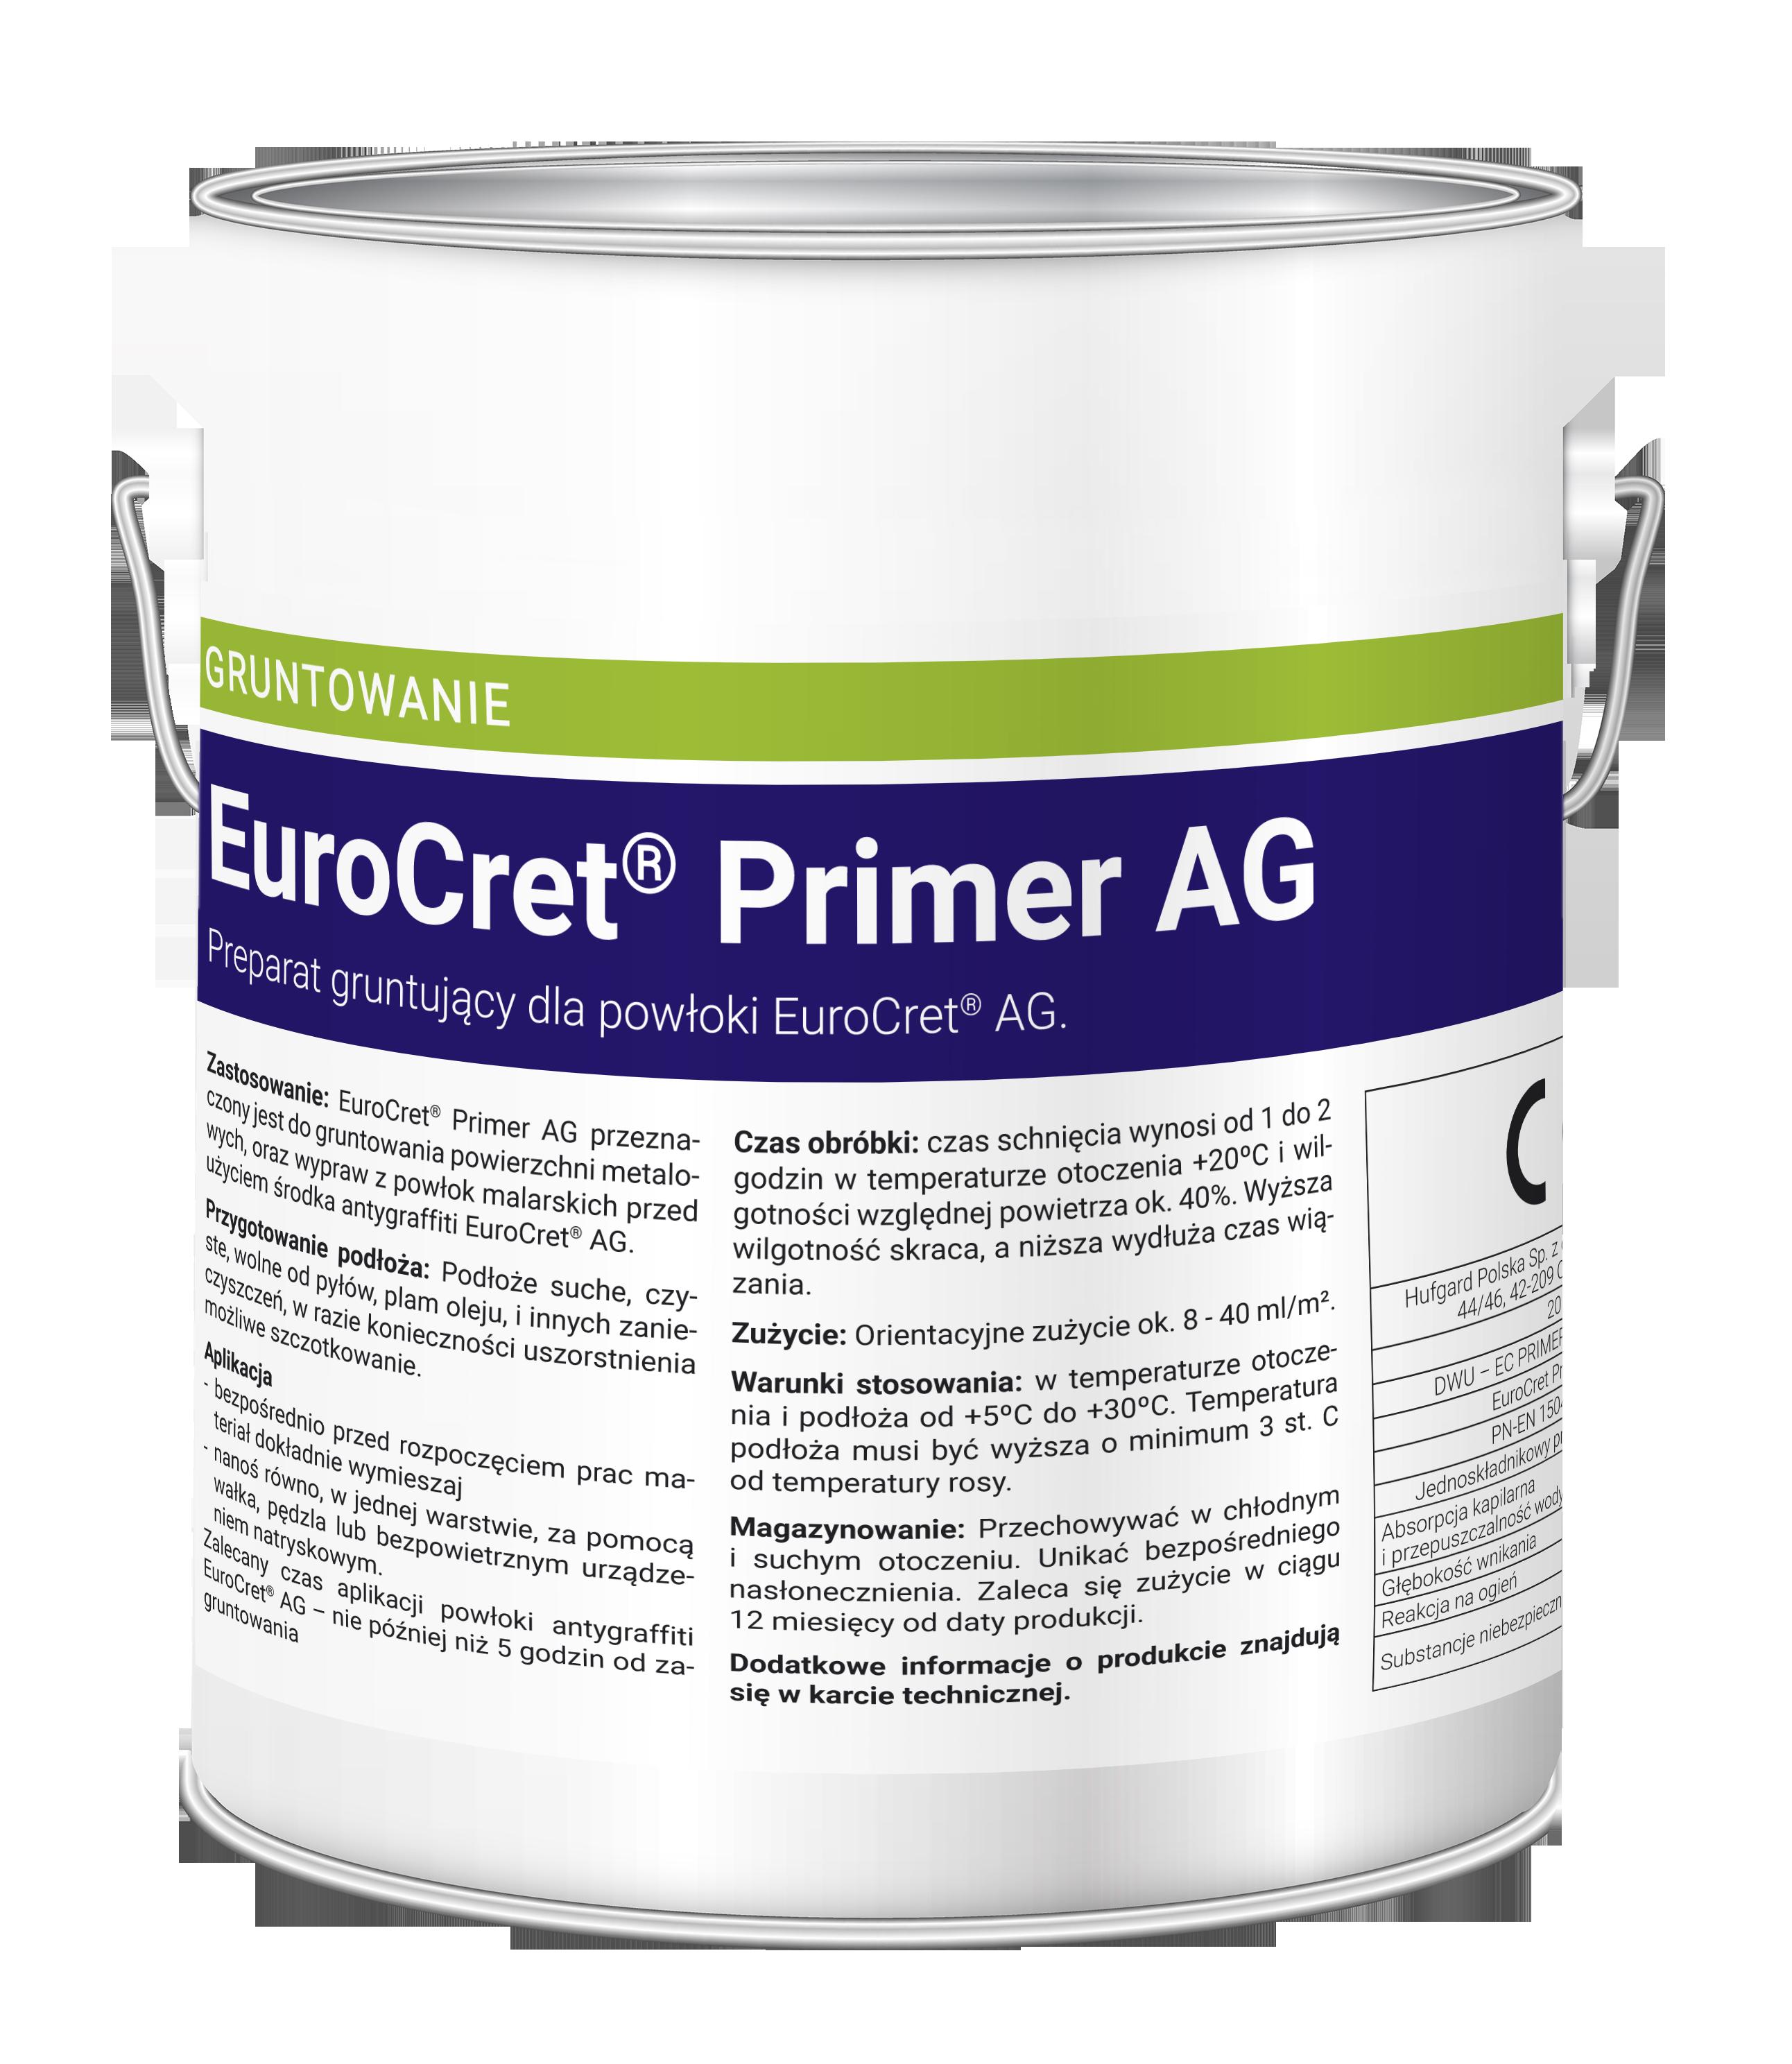 EuroCret Primer AG